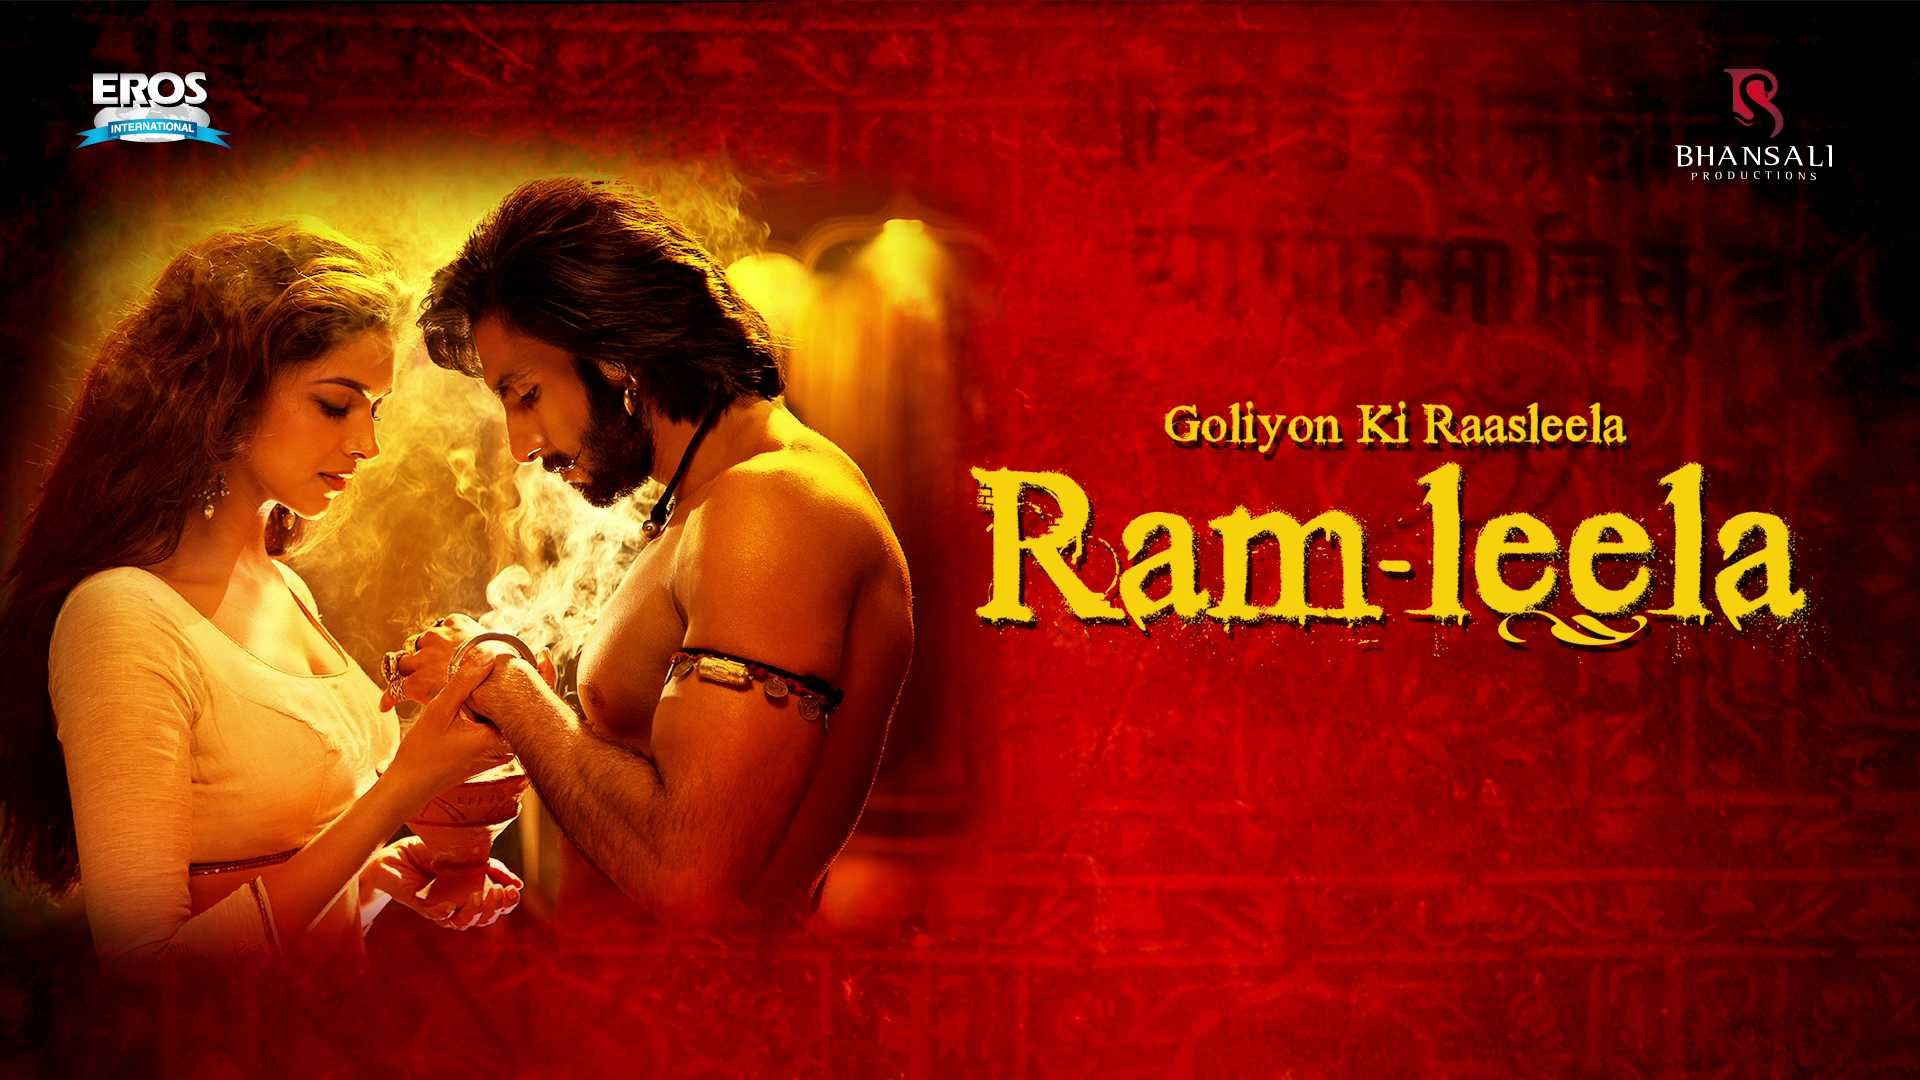 GOLIYON KI RAASLEELA RAM LEELA Bollywood Drama Musical Romance Deepika Padukone Wallpaper